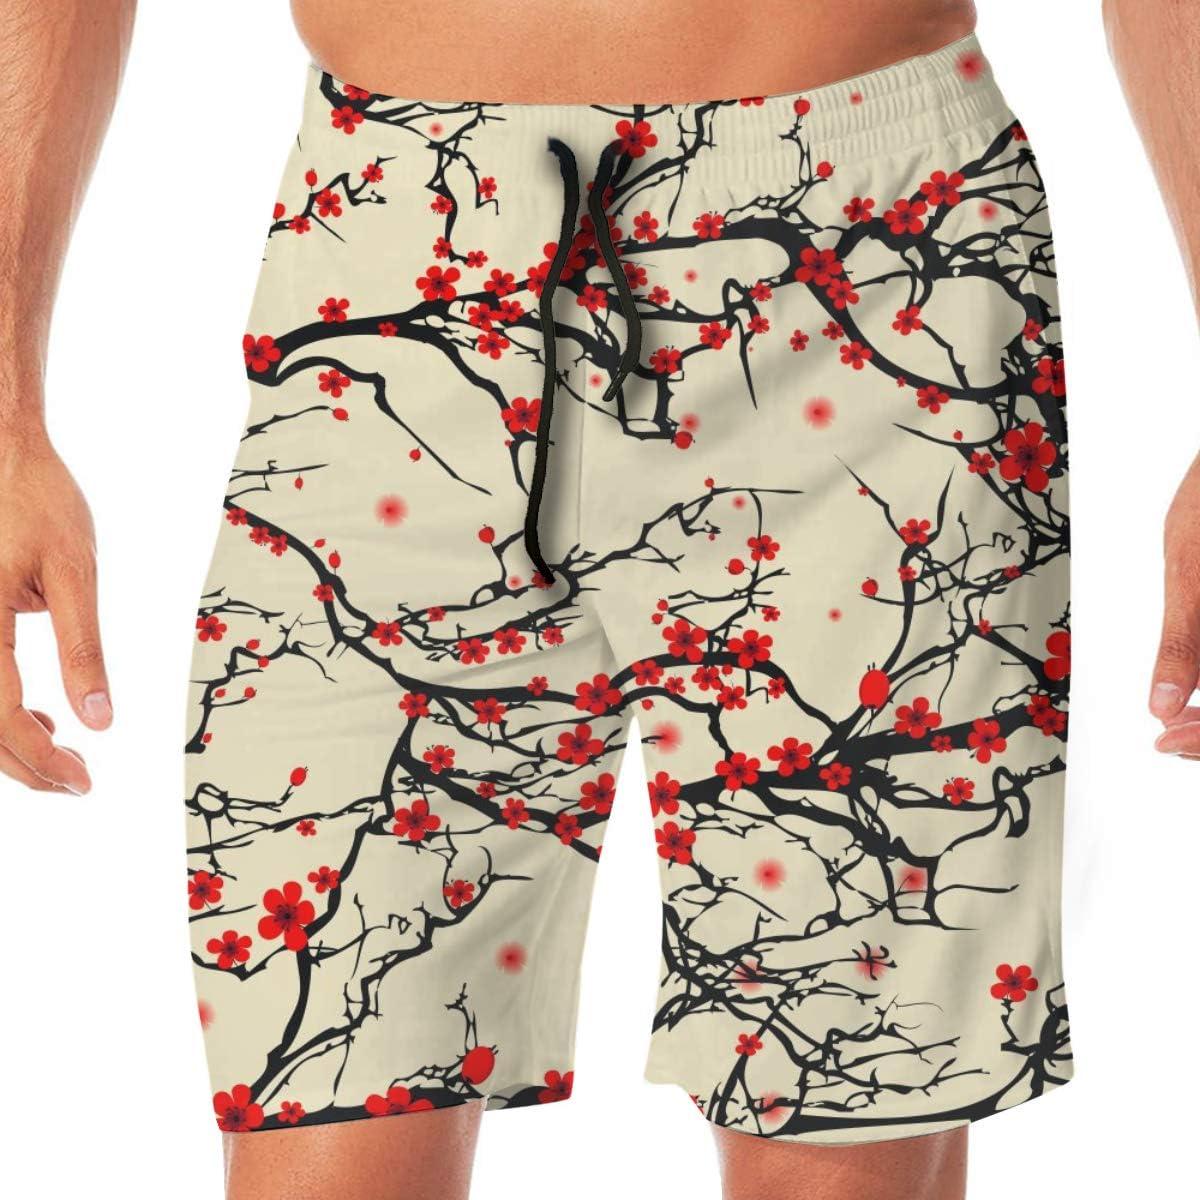 Japanese Cherry Blossom Summer Mens Quick-Drying Swim Trunks Beach Shorts